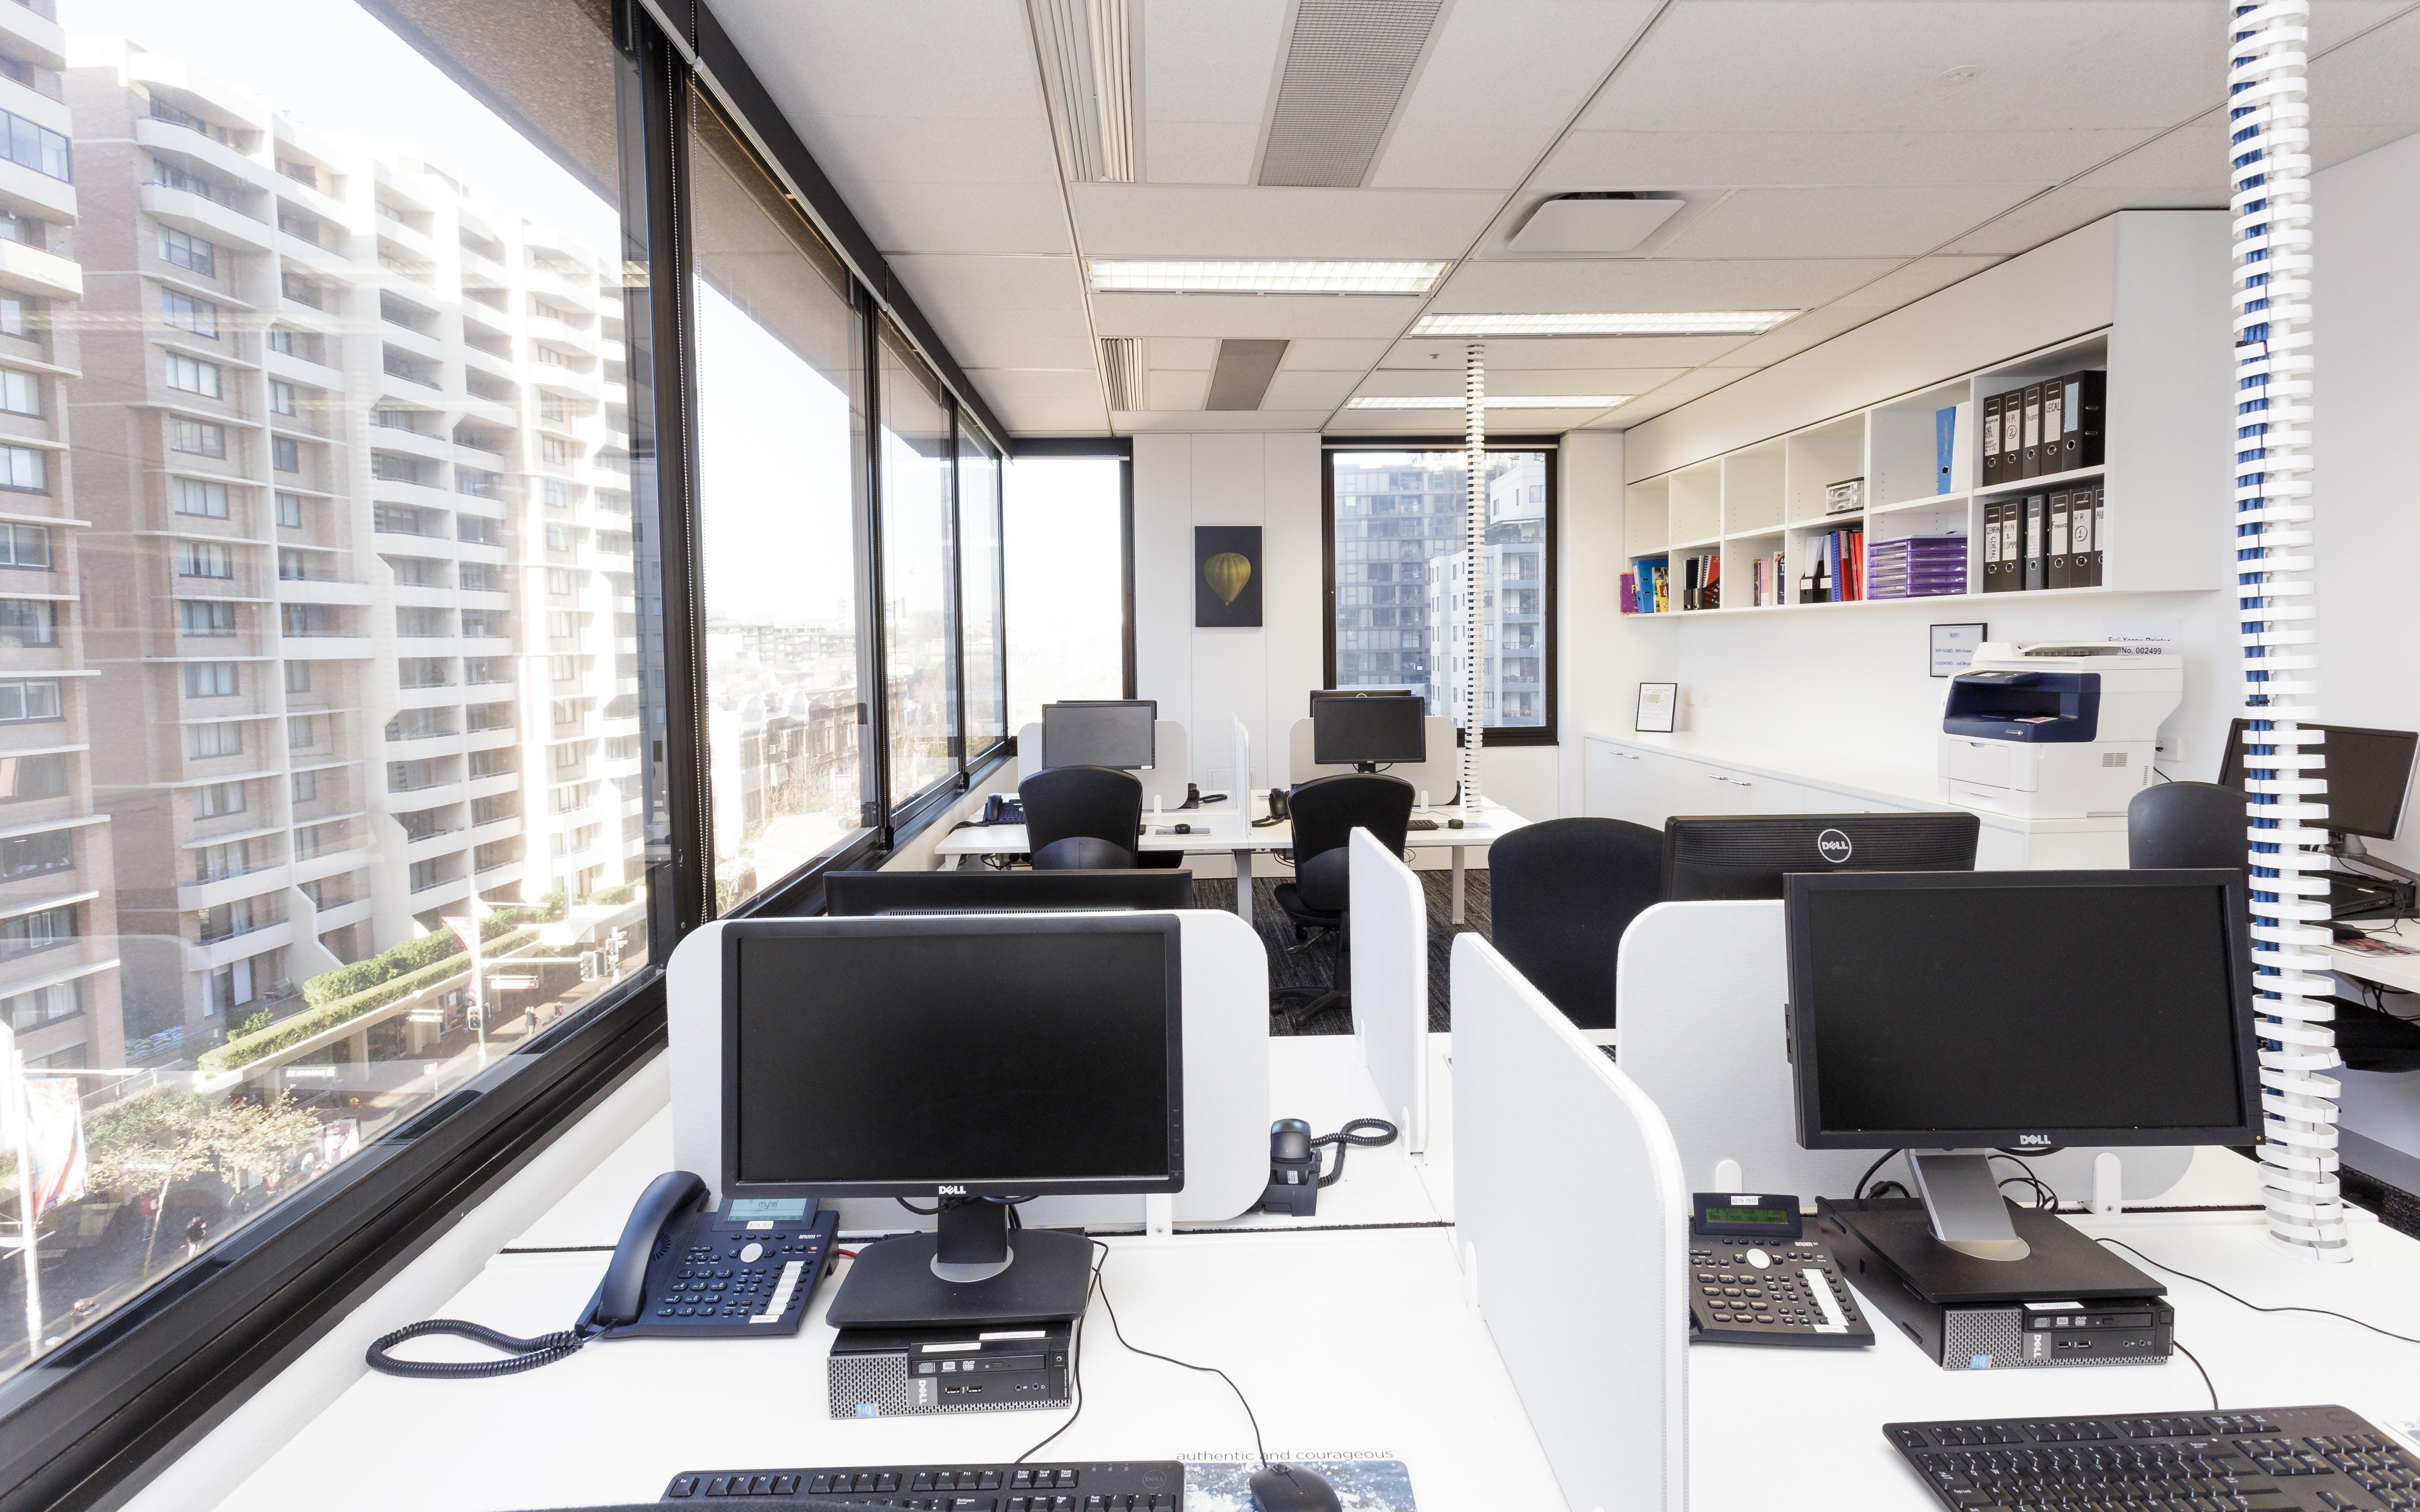 Freeman Room: Computer training room with natural light. Close to Sydney CBD, image 1